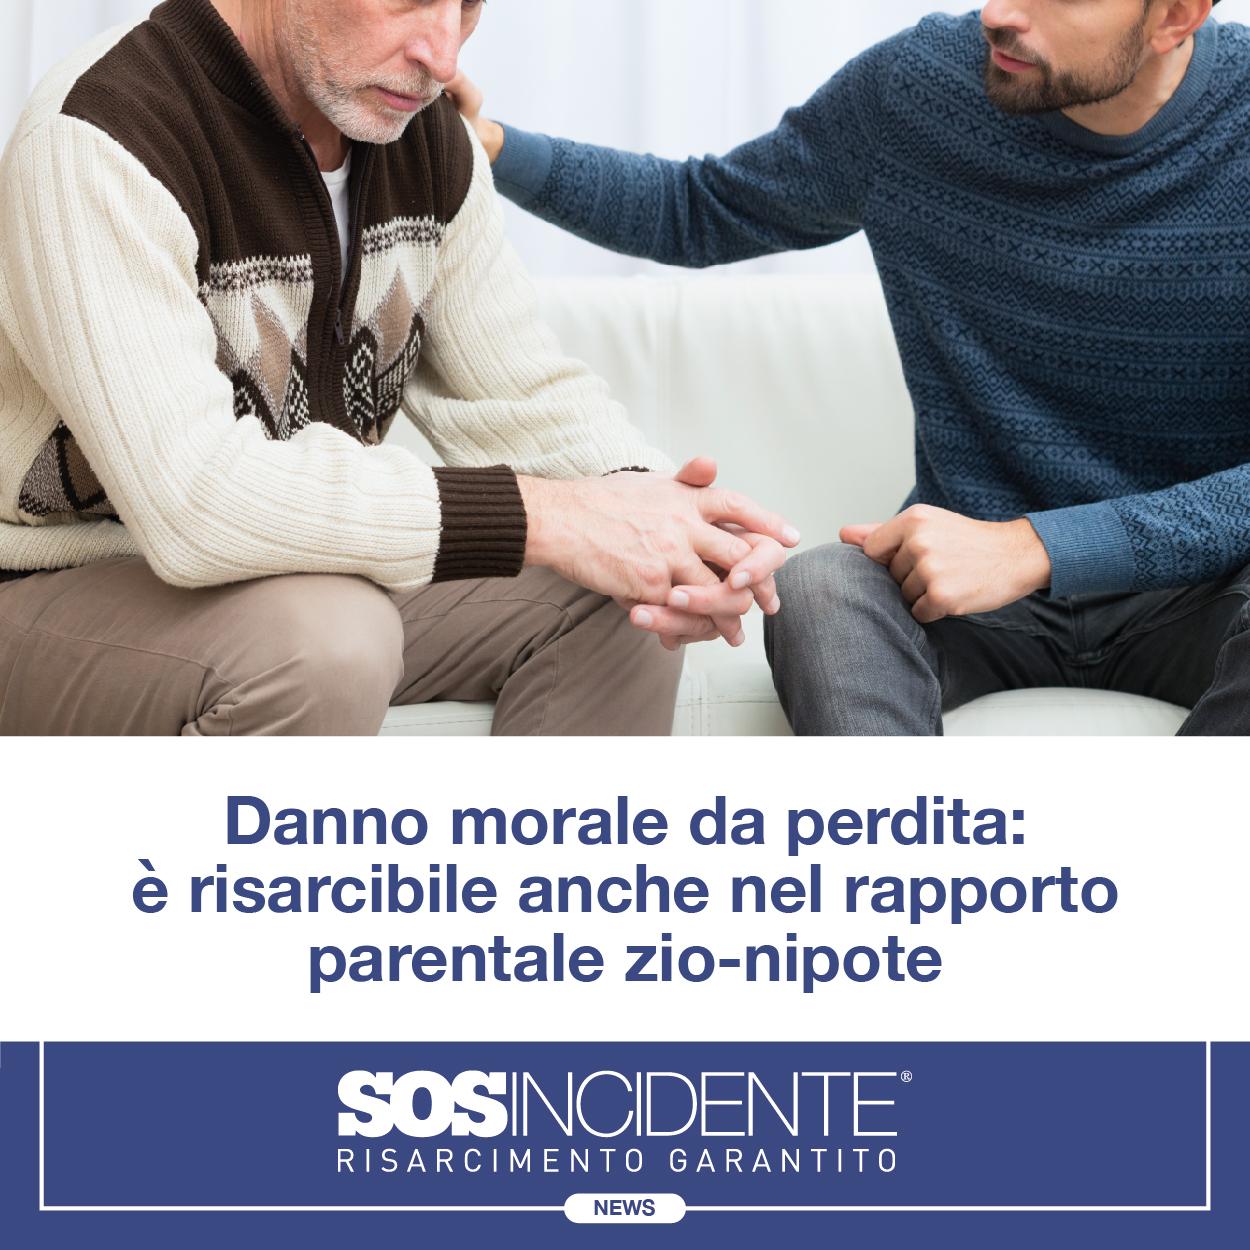 SOSIncidente_DannoMorale_News